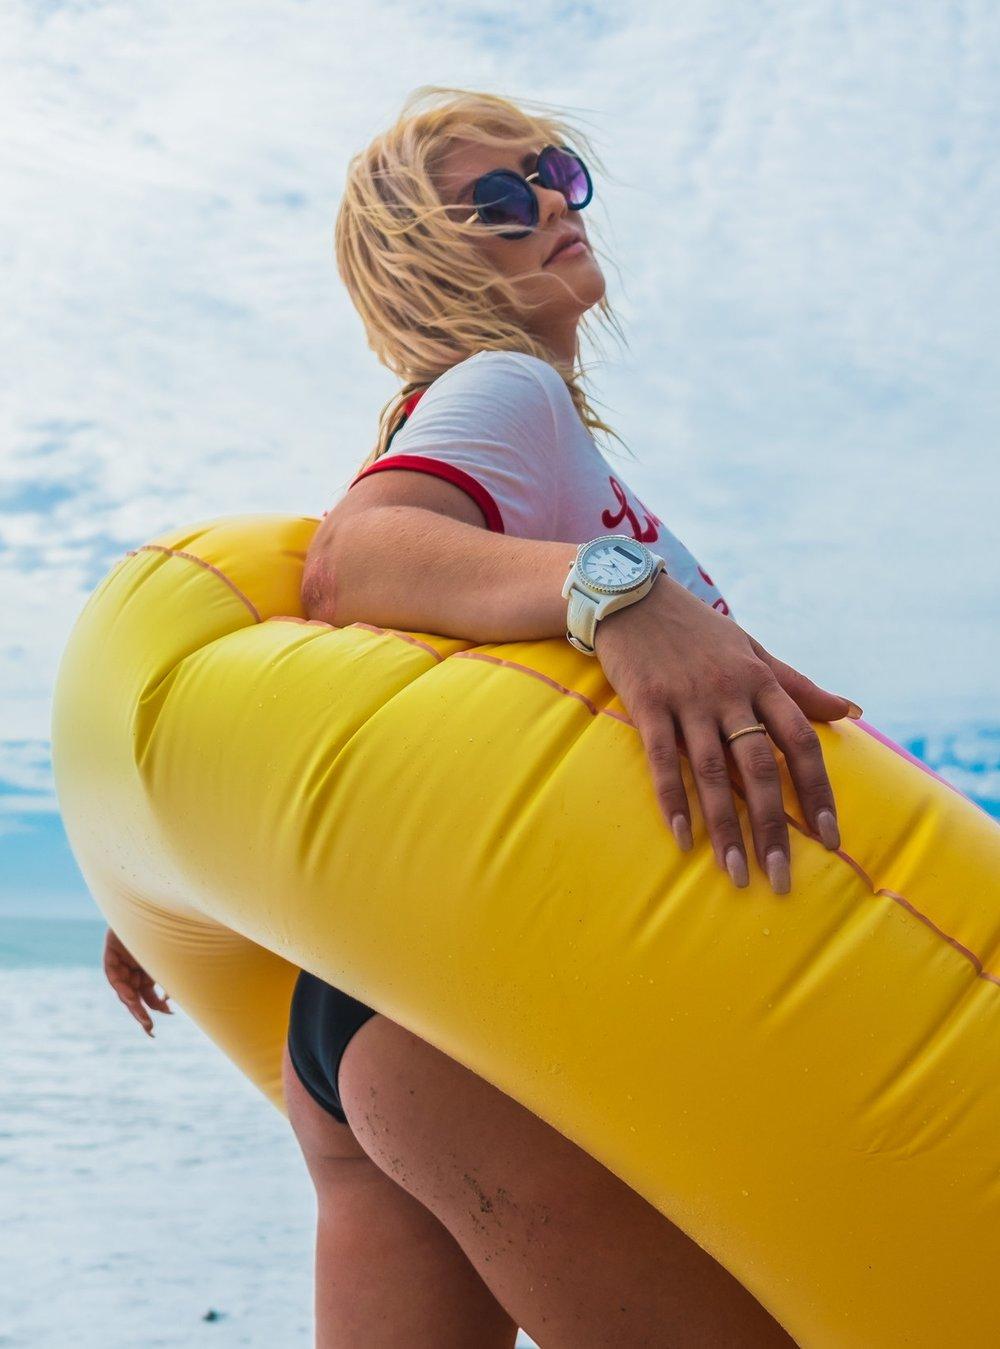 beachgirls-4964.jpg